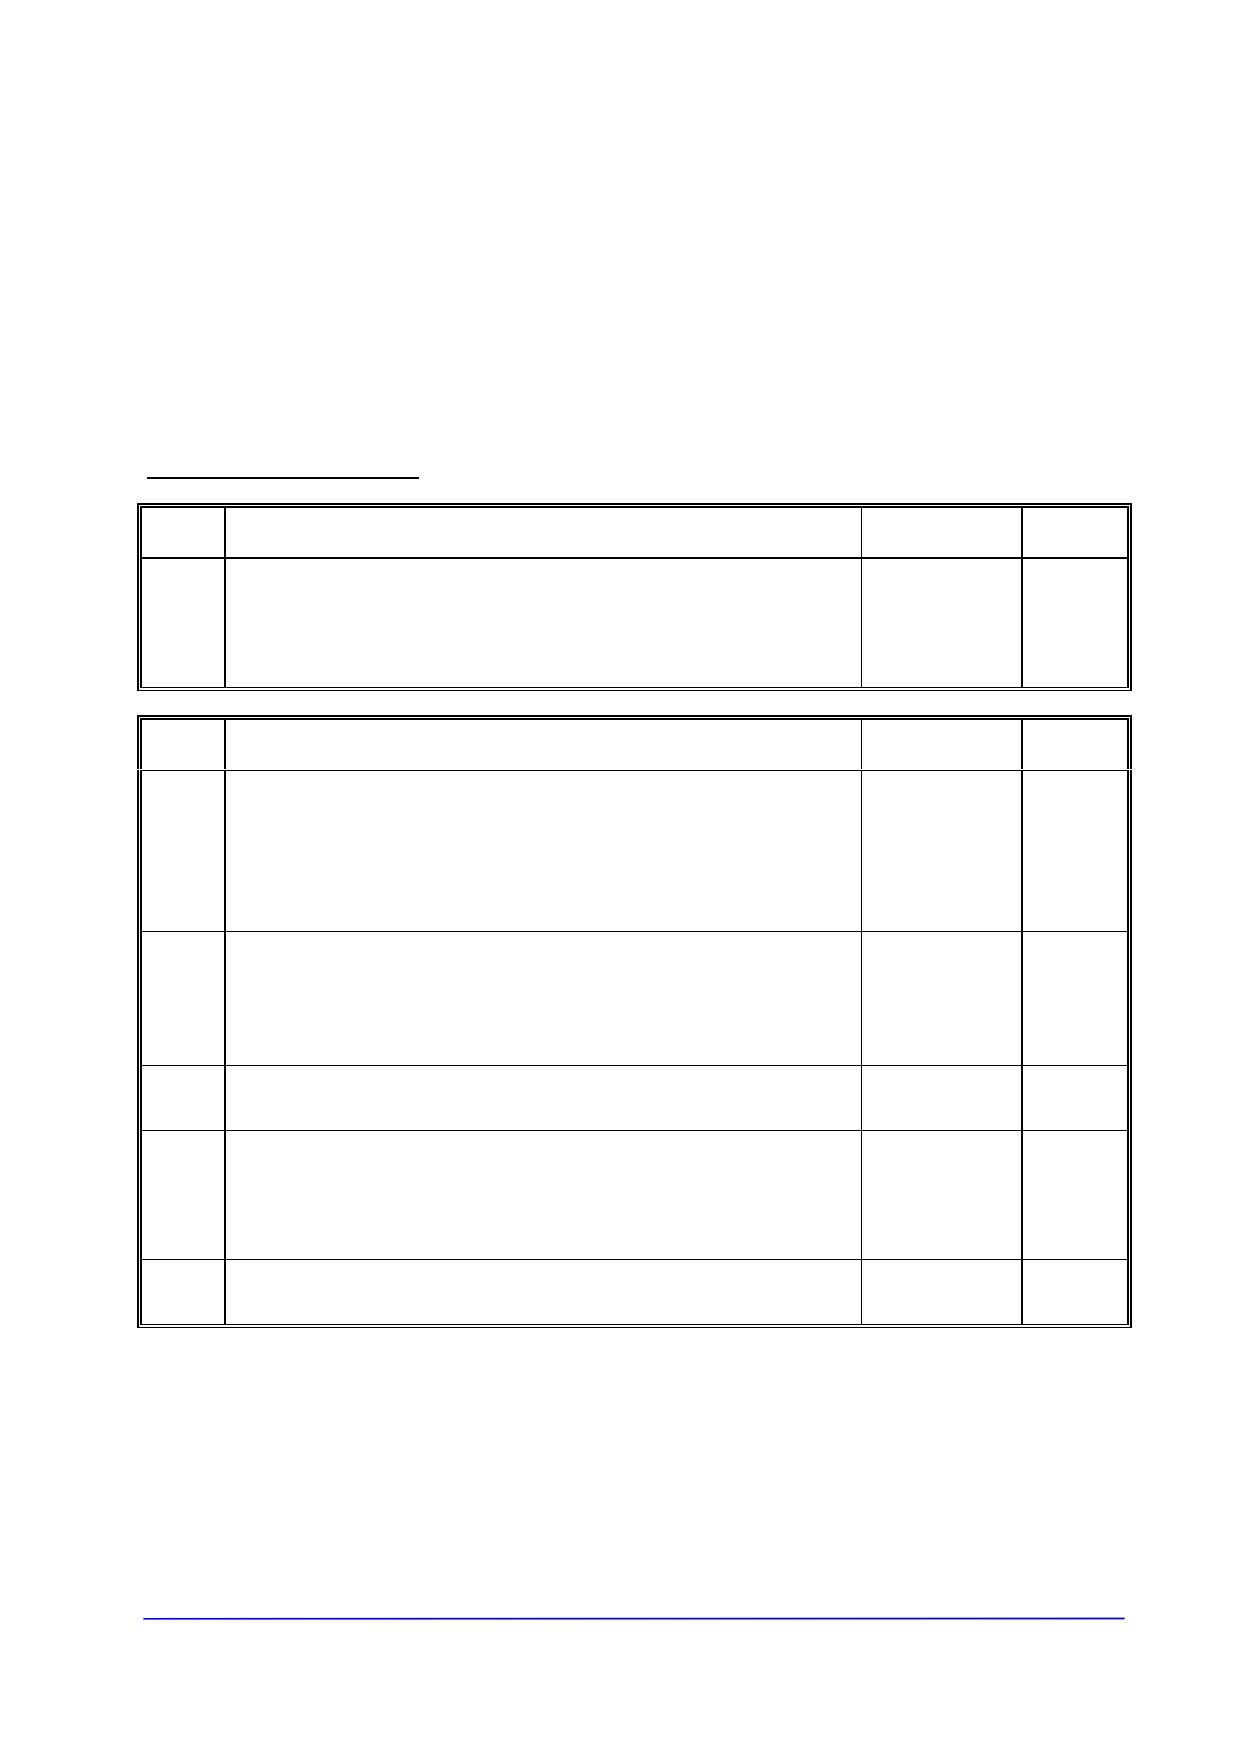 R0577YS12E datasheet